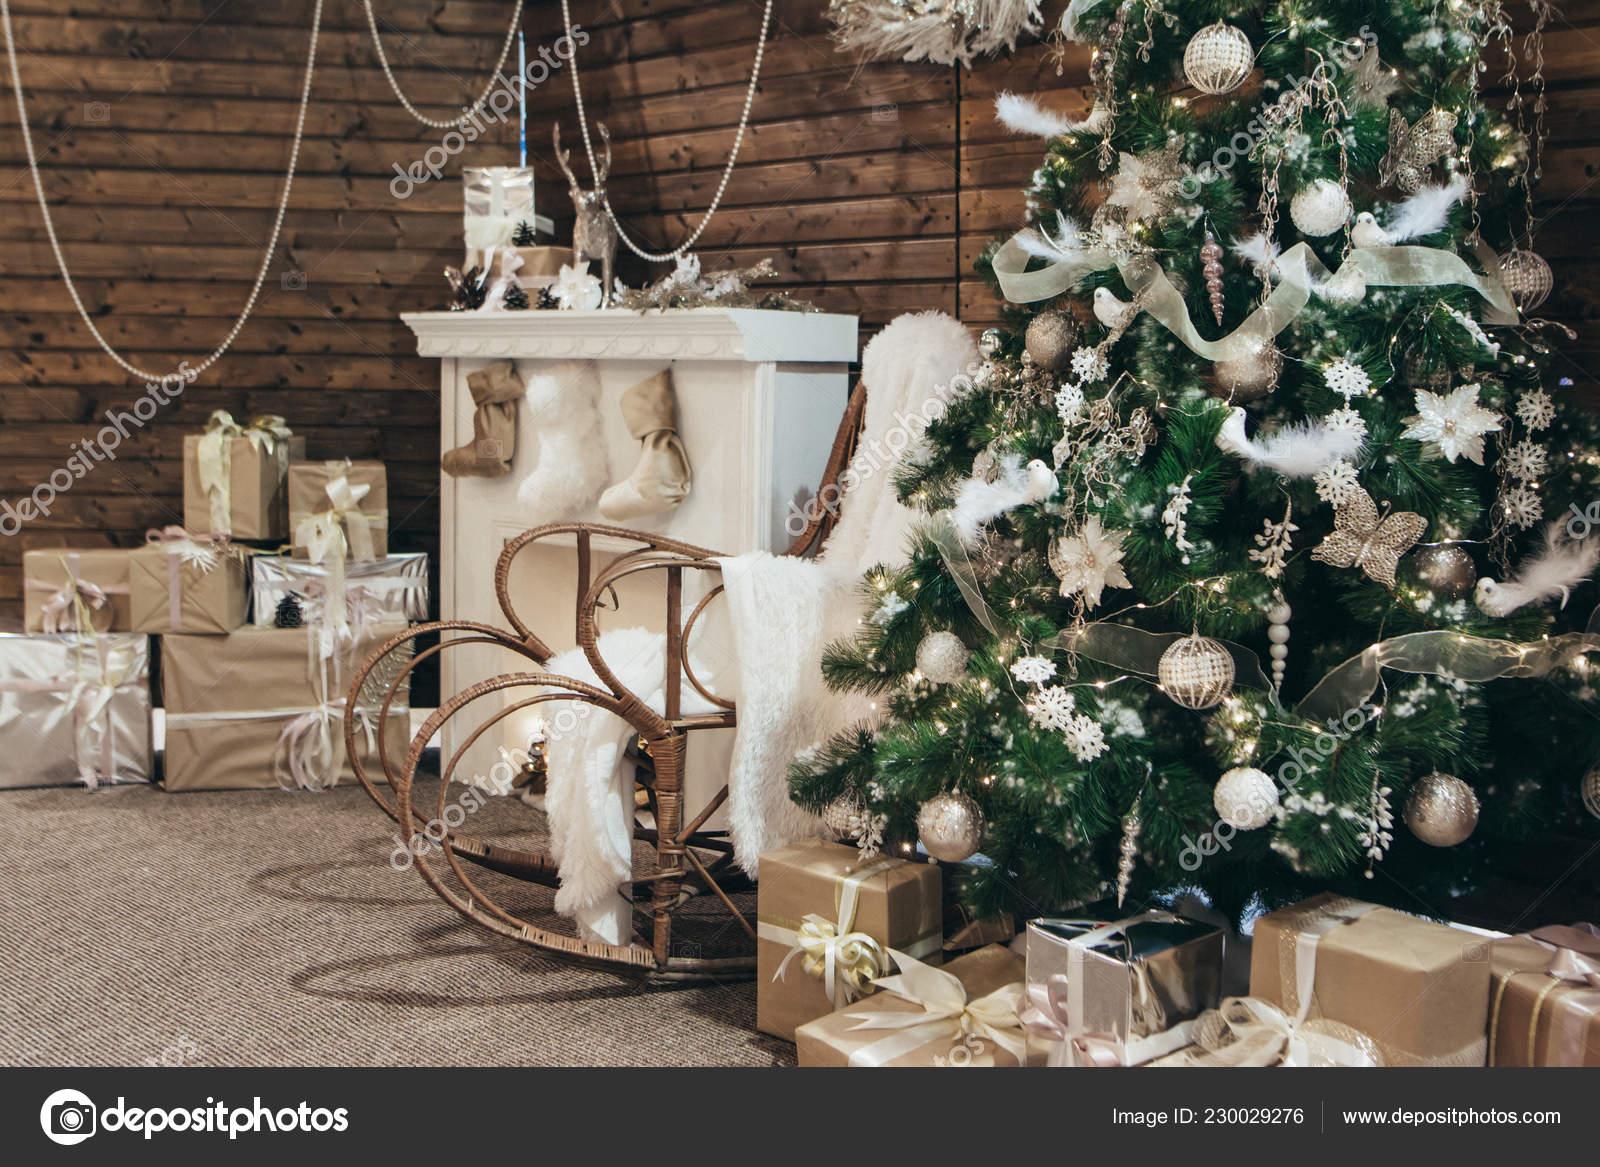 https://st4.depositphotos.com/11328482/23002/i/1600/depositphotos_230029276-stock-photo-decor-christmas-photo-zone-christmas.jpg